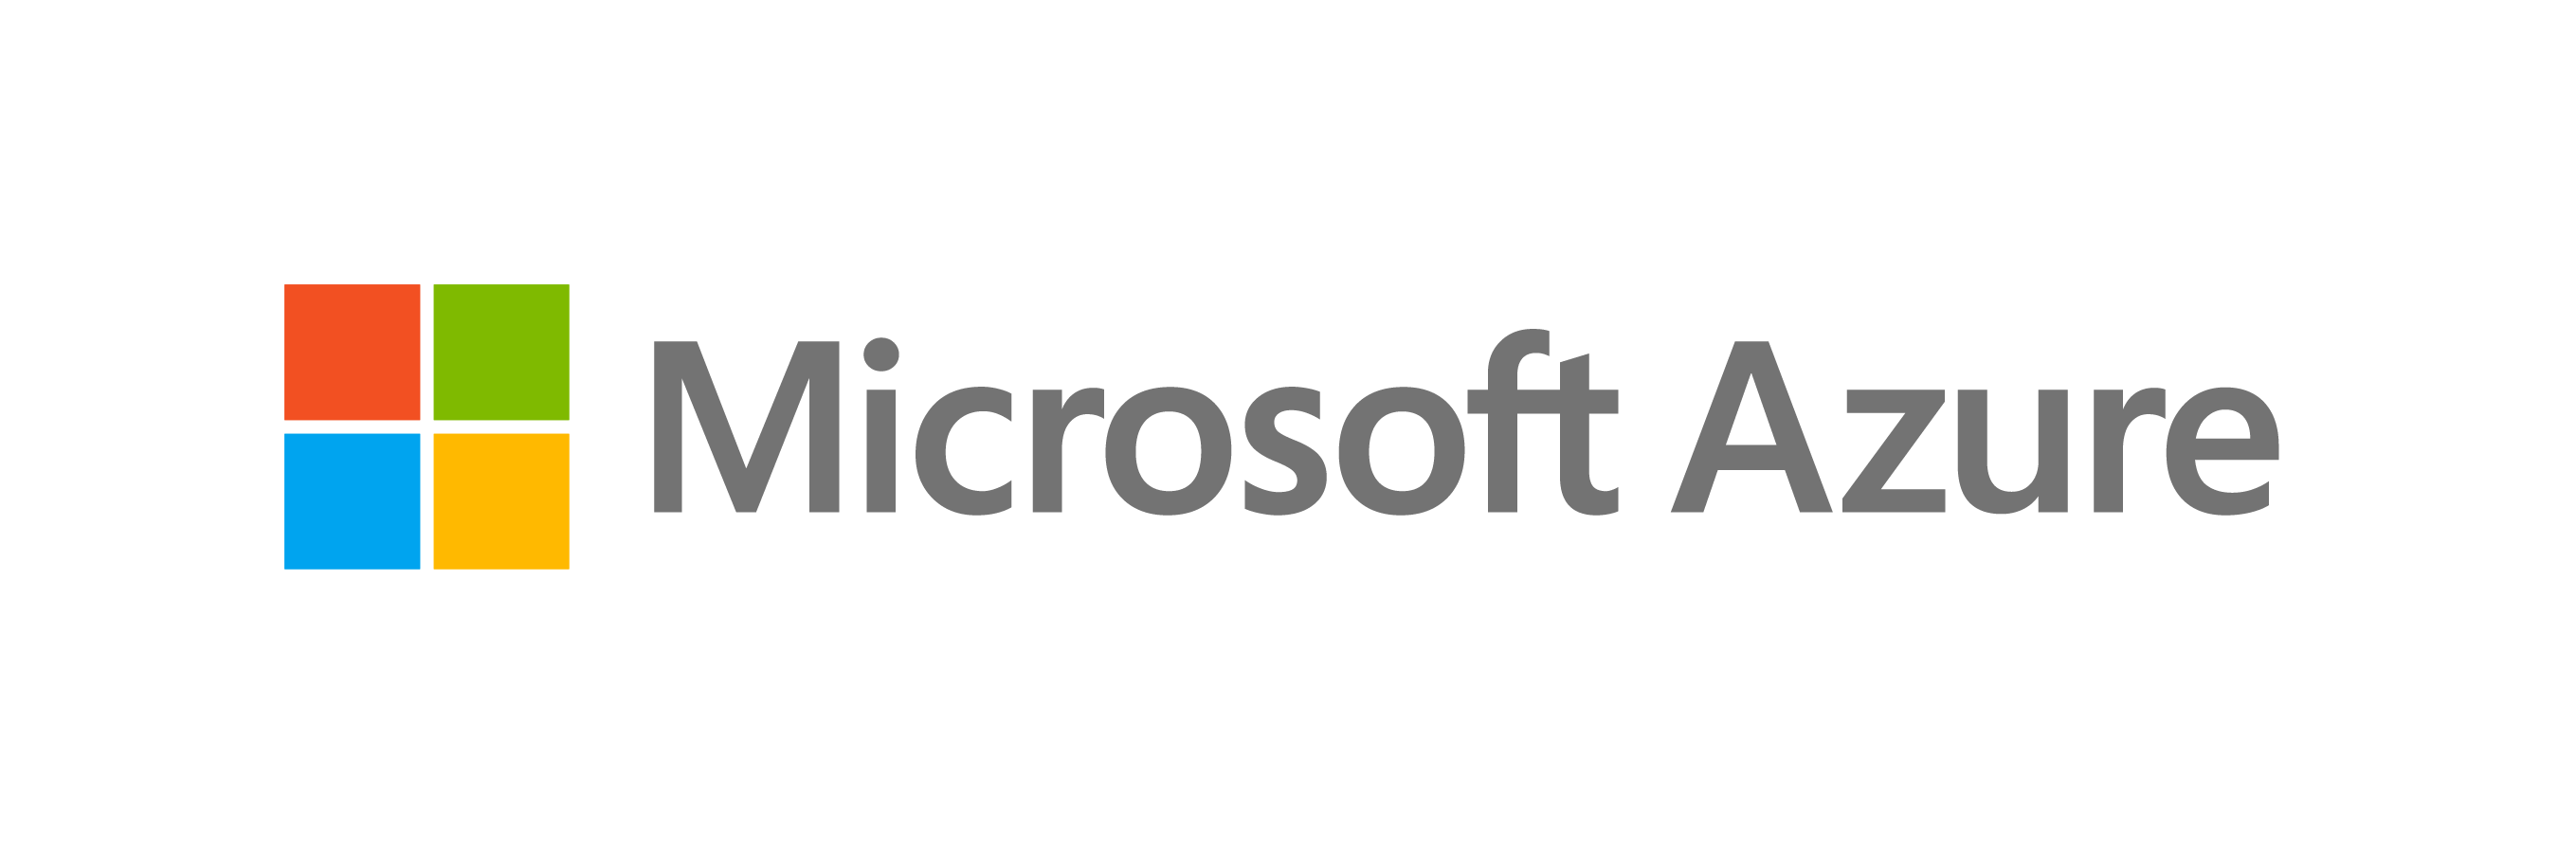 Microsoft Azure's logo